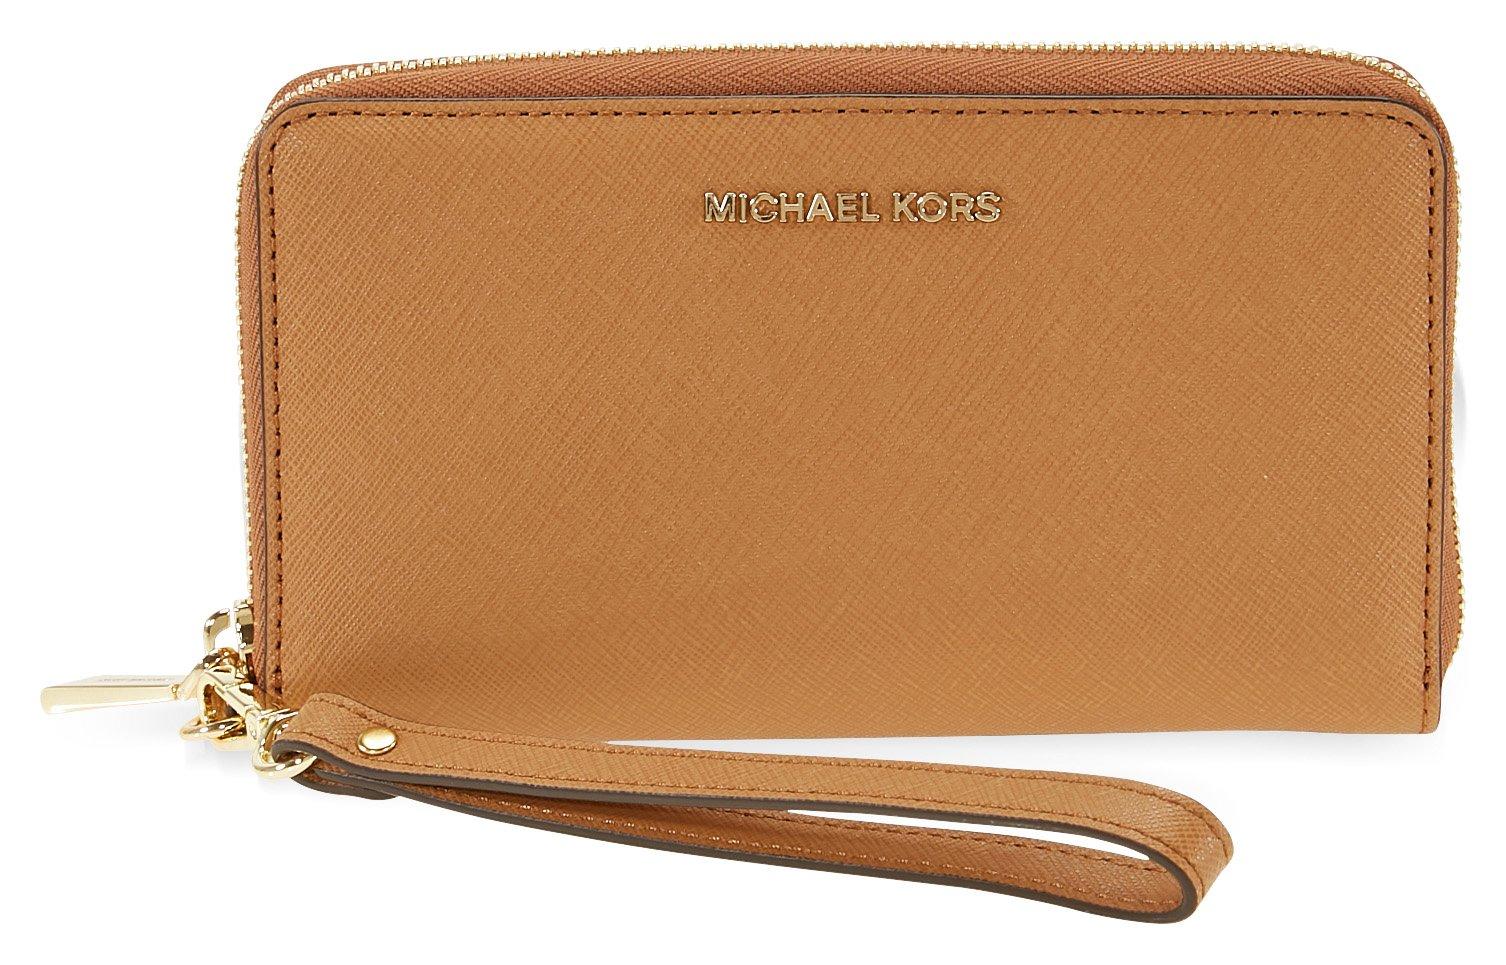 Michael Kors Jet Set Travel Large Smartphone Wristlet - Acorn